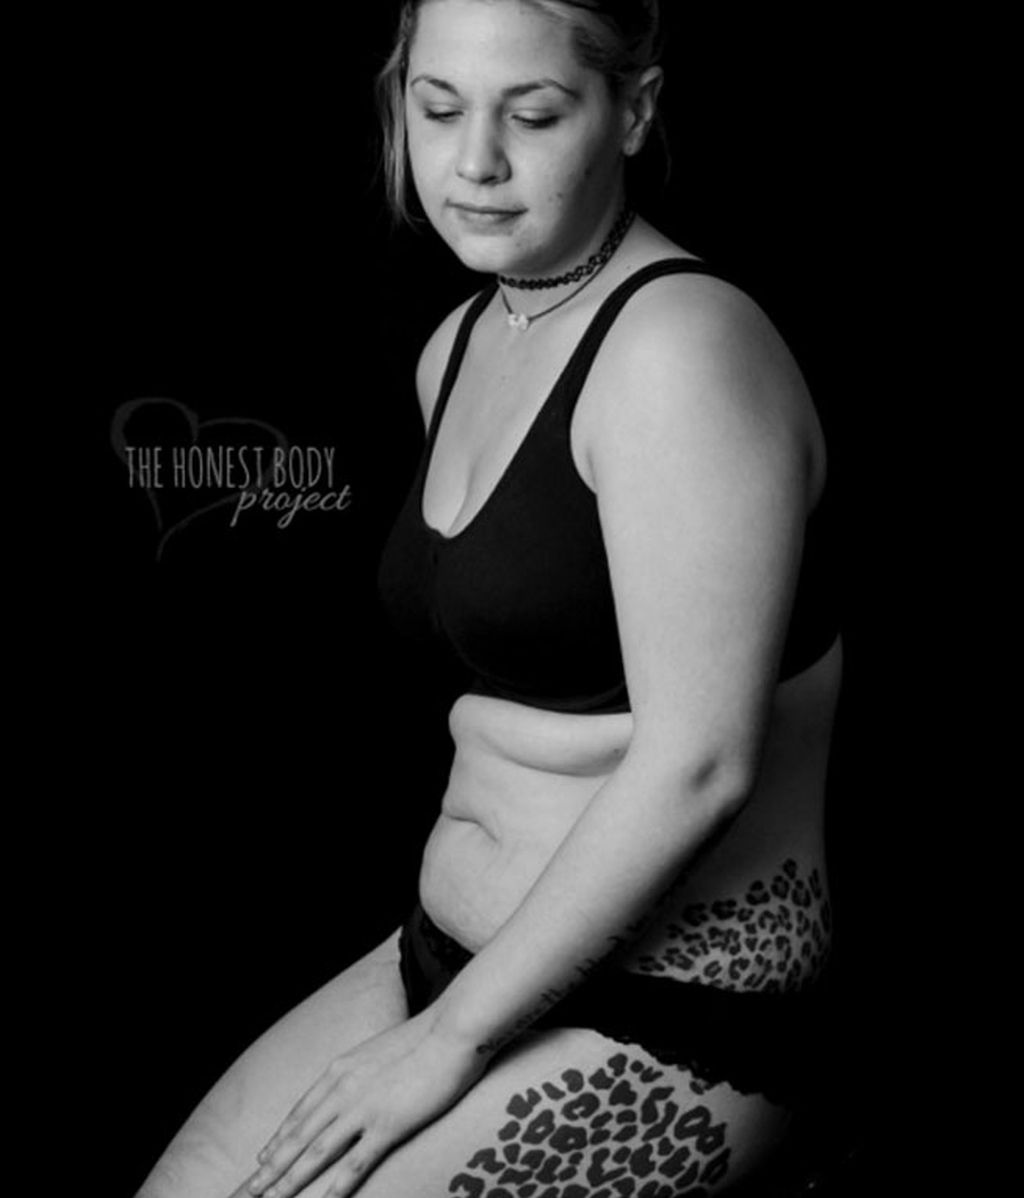 El proyecto de la fotógrafa Natalie McCain